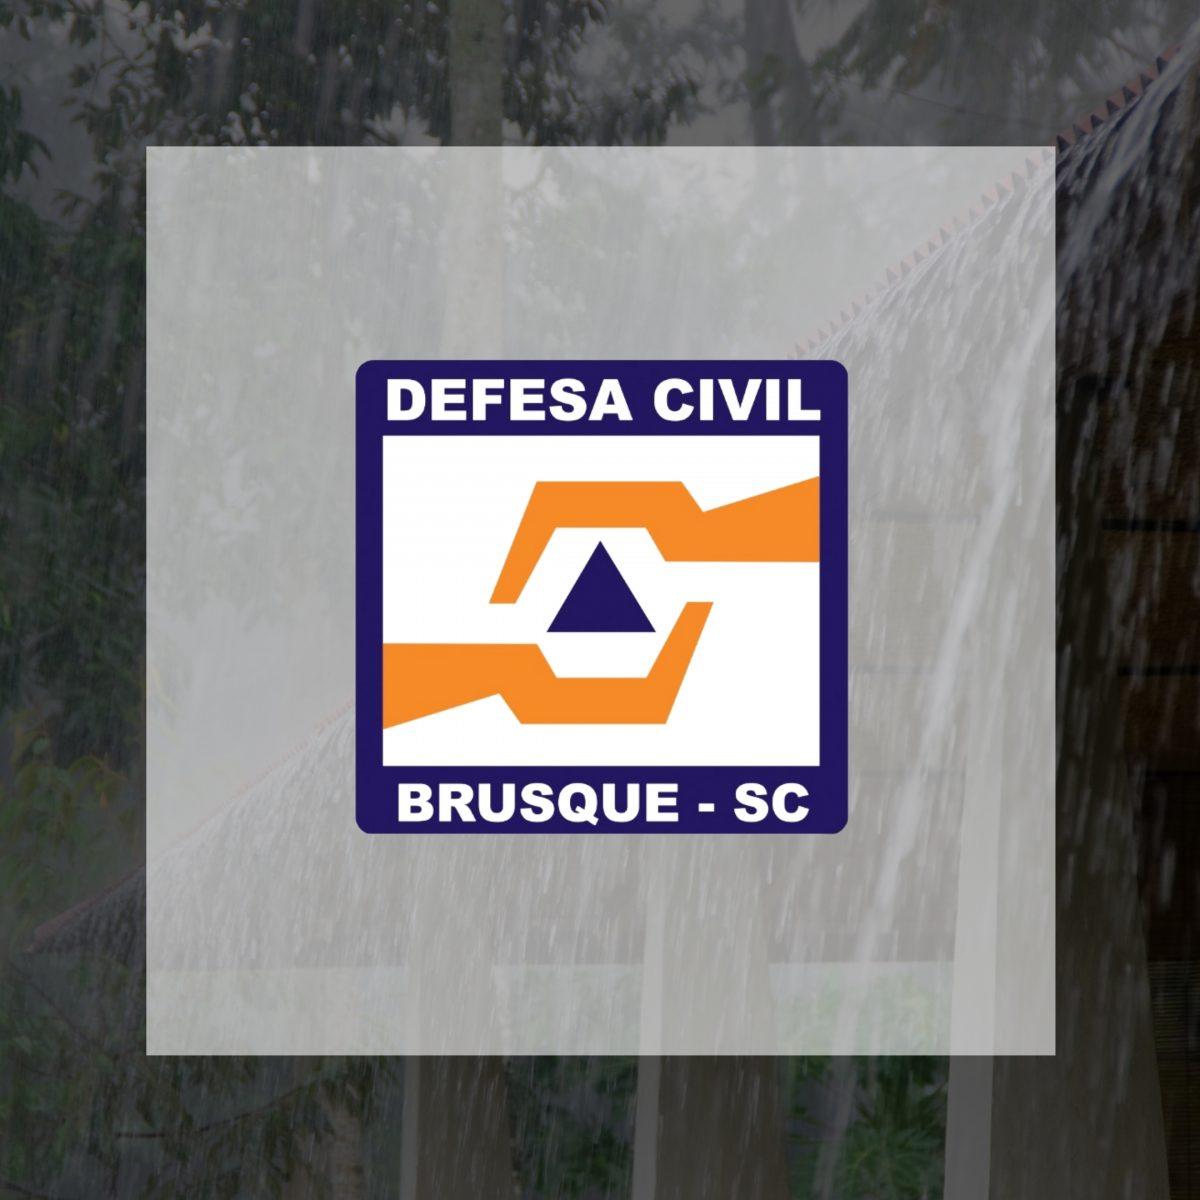 Defesa Civil alerta para possível ocorrência de chuva intensa